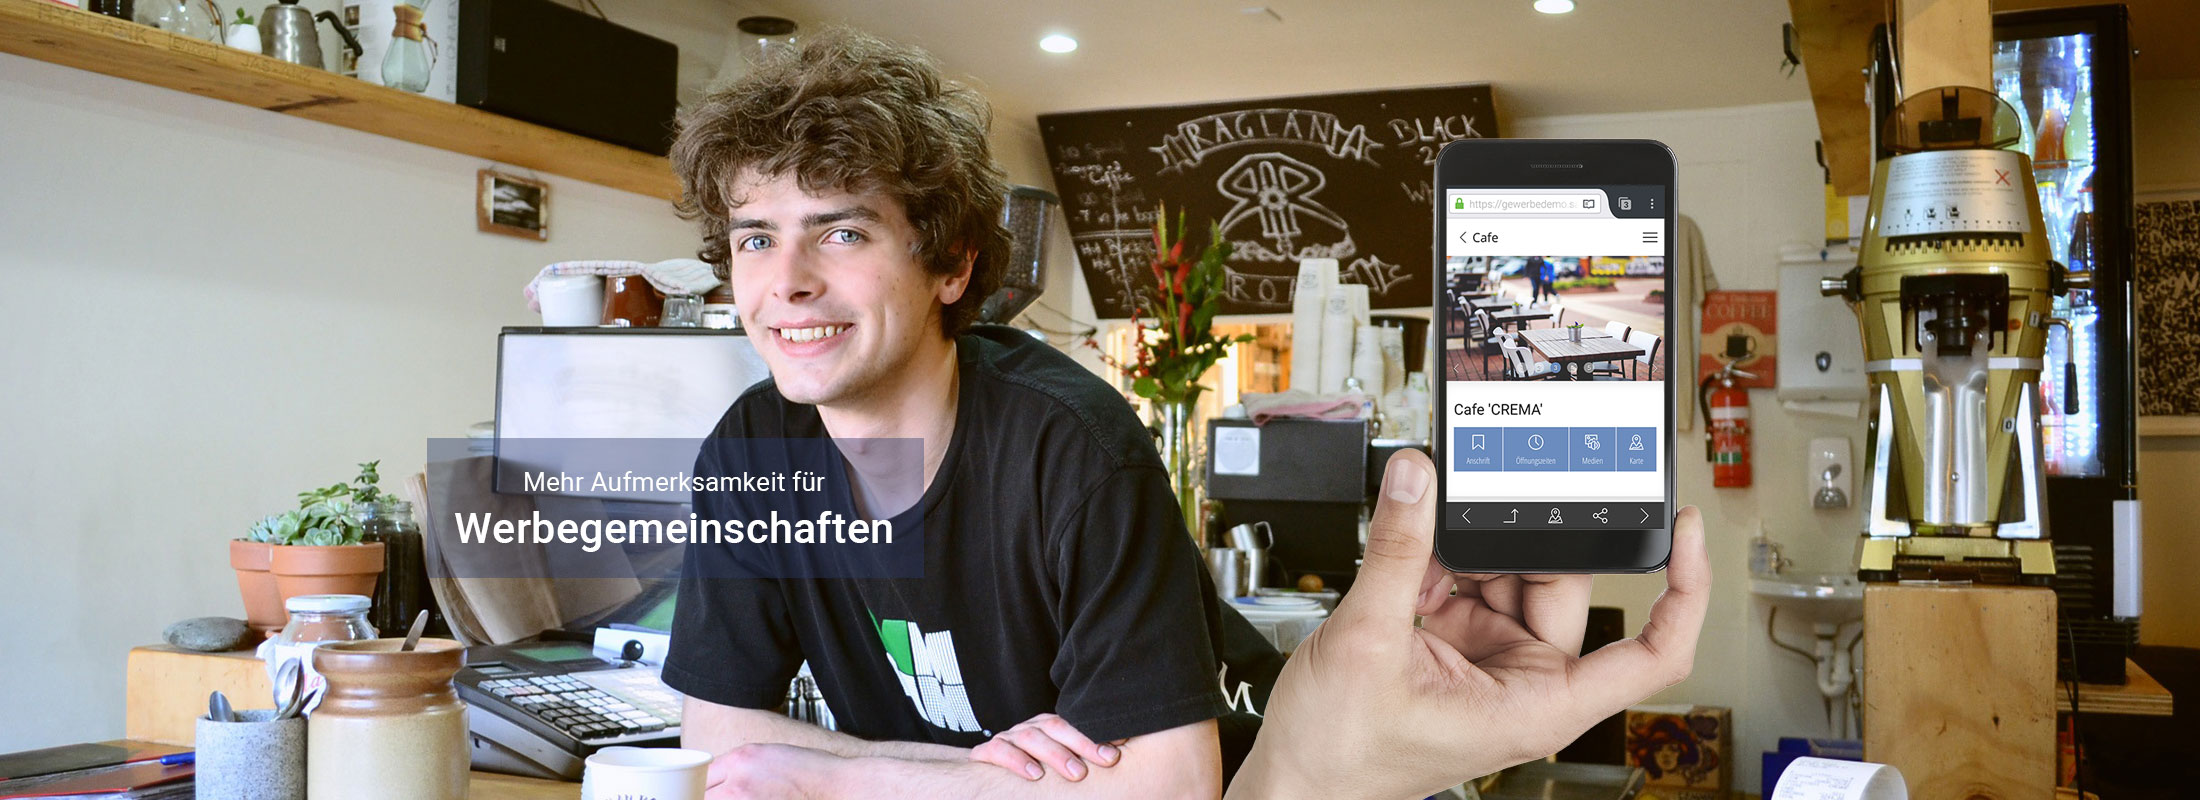 satelles mobilewebguide: digitales Stadtmarketing